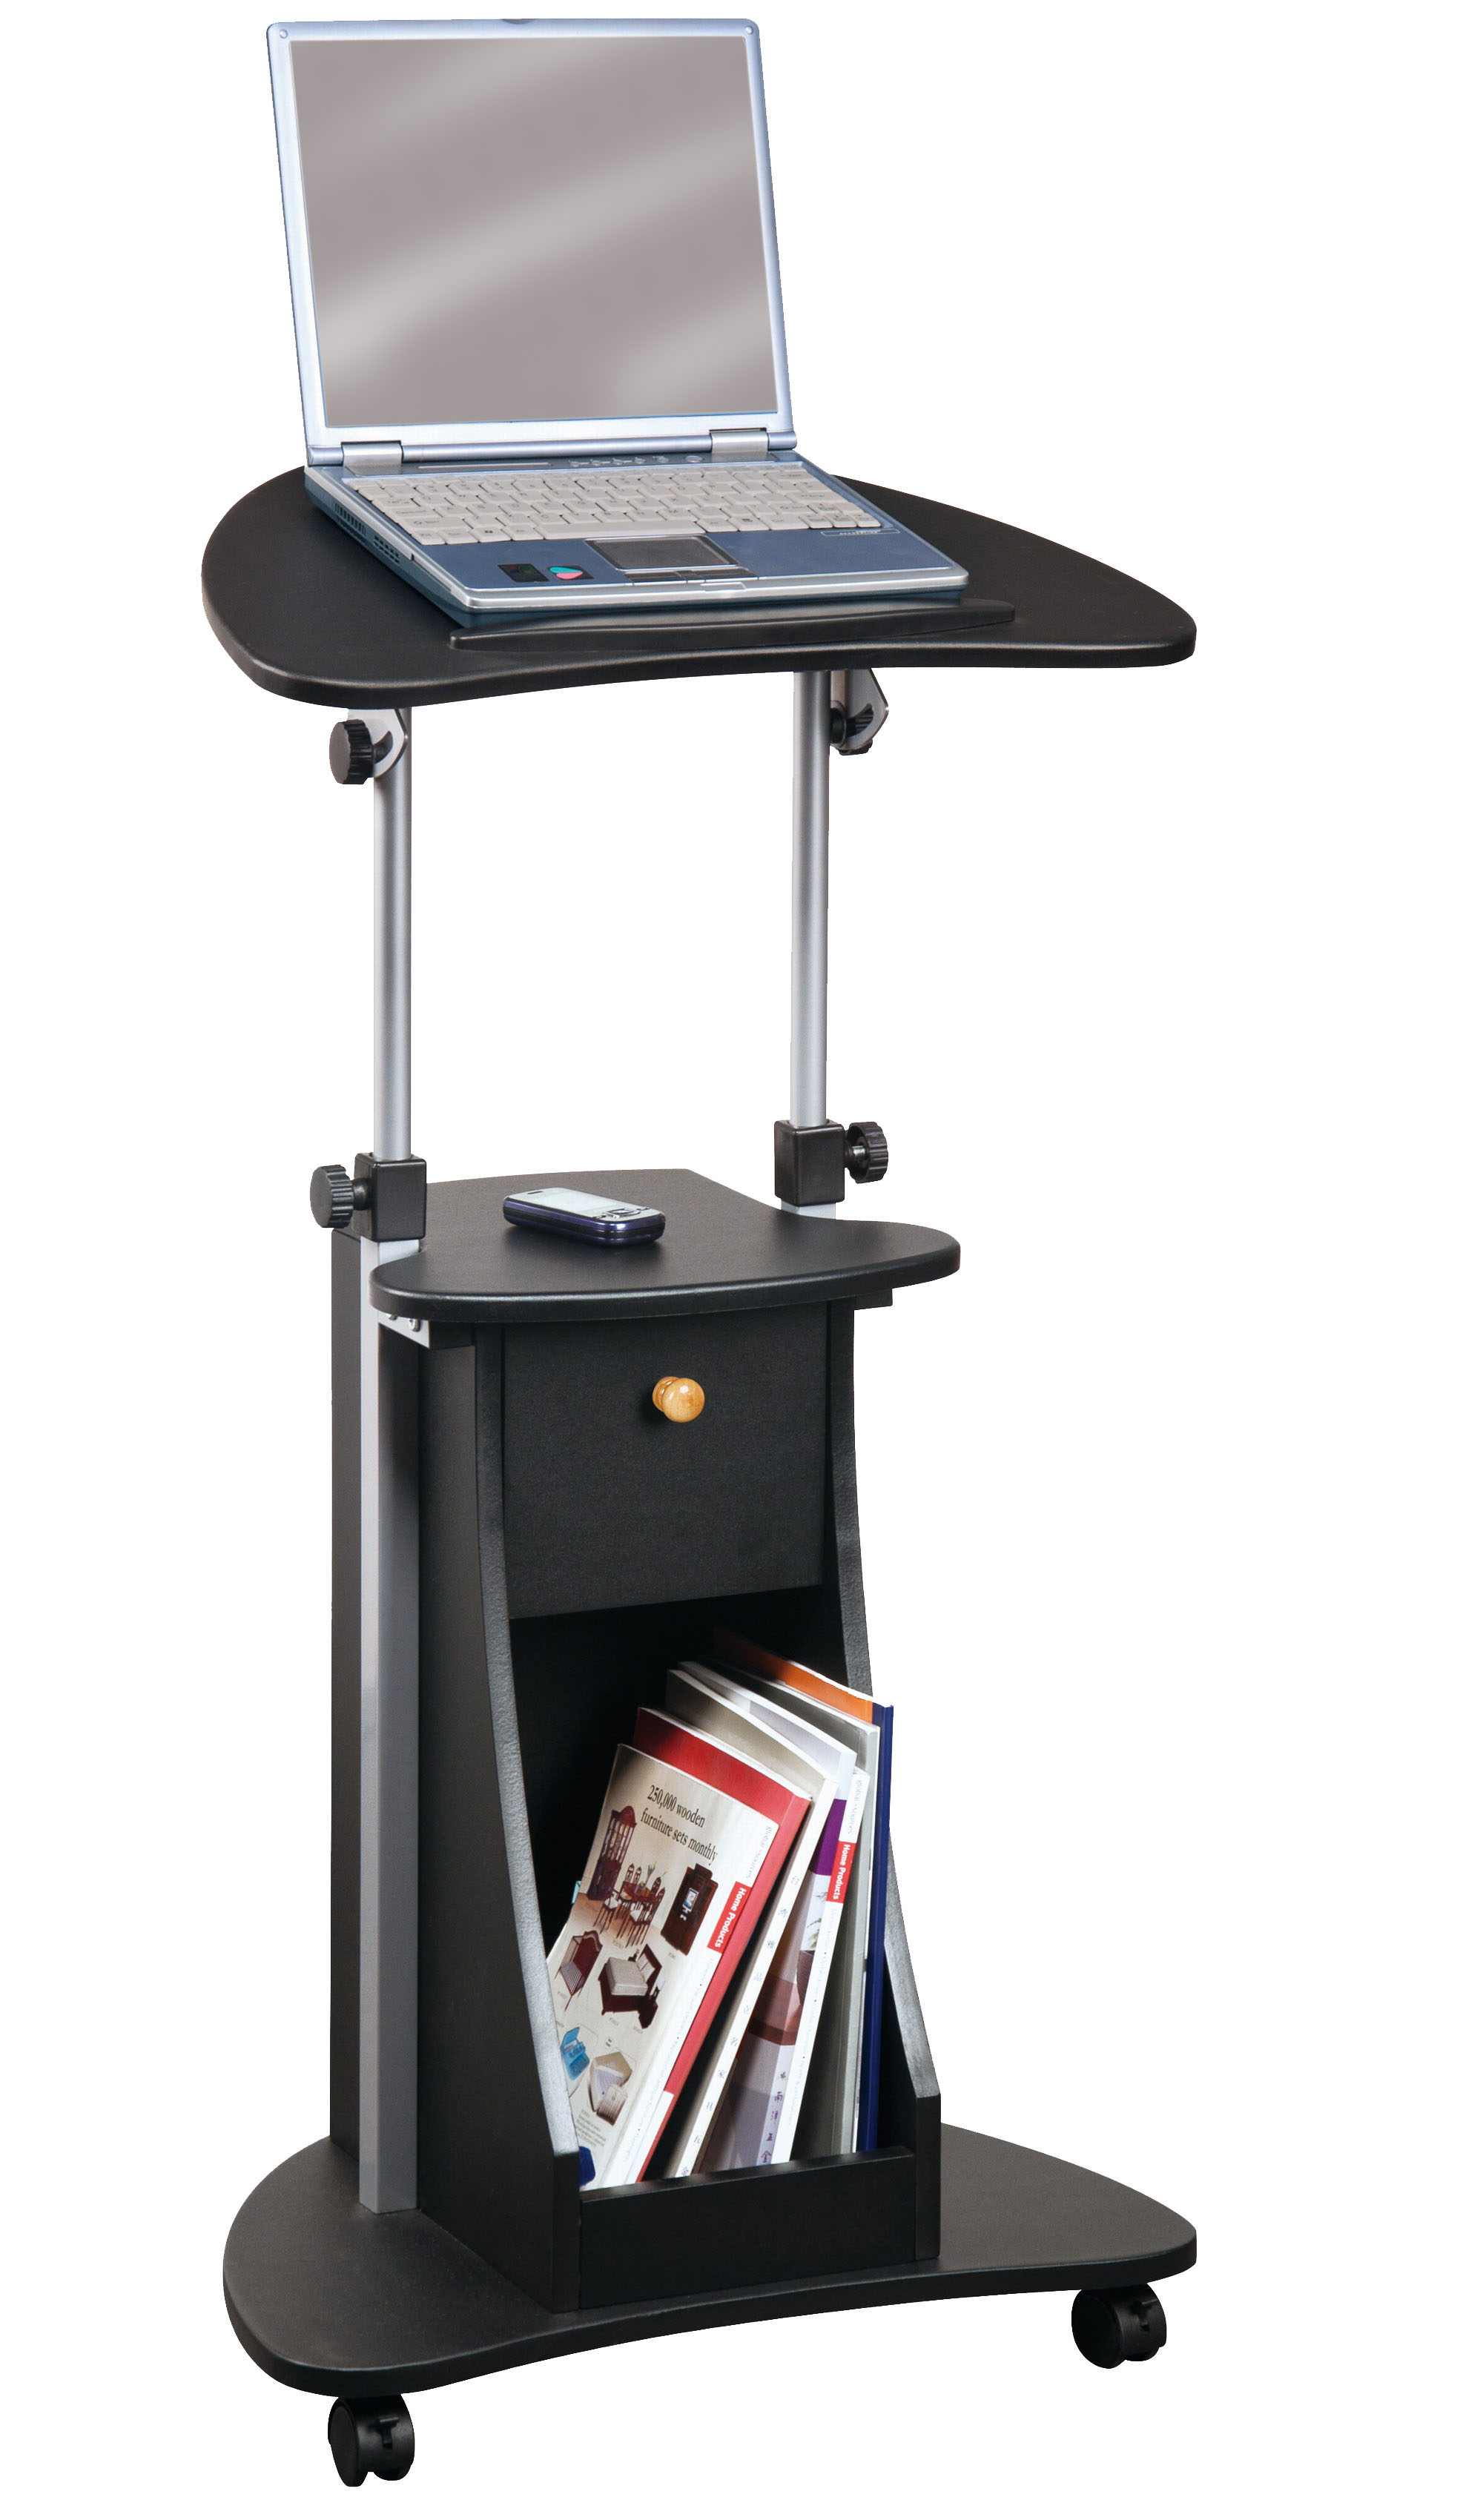 Computer and Laptop Carts Rolling Laptop Desk OrganizeIt